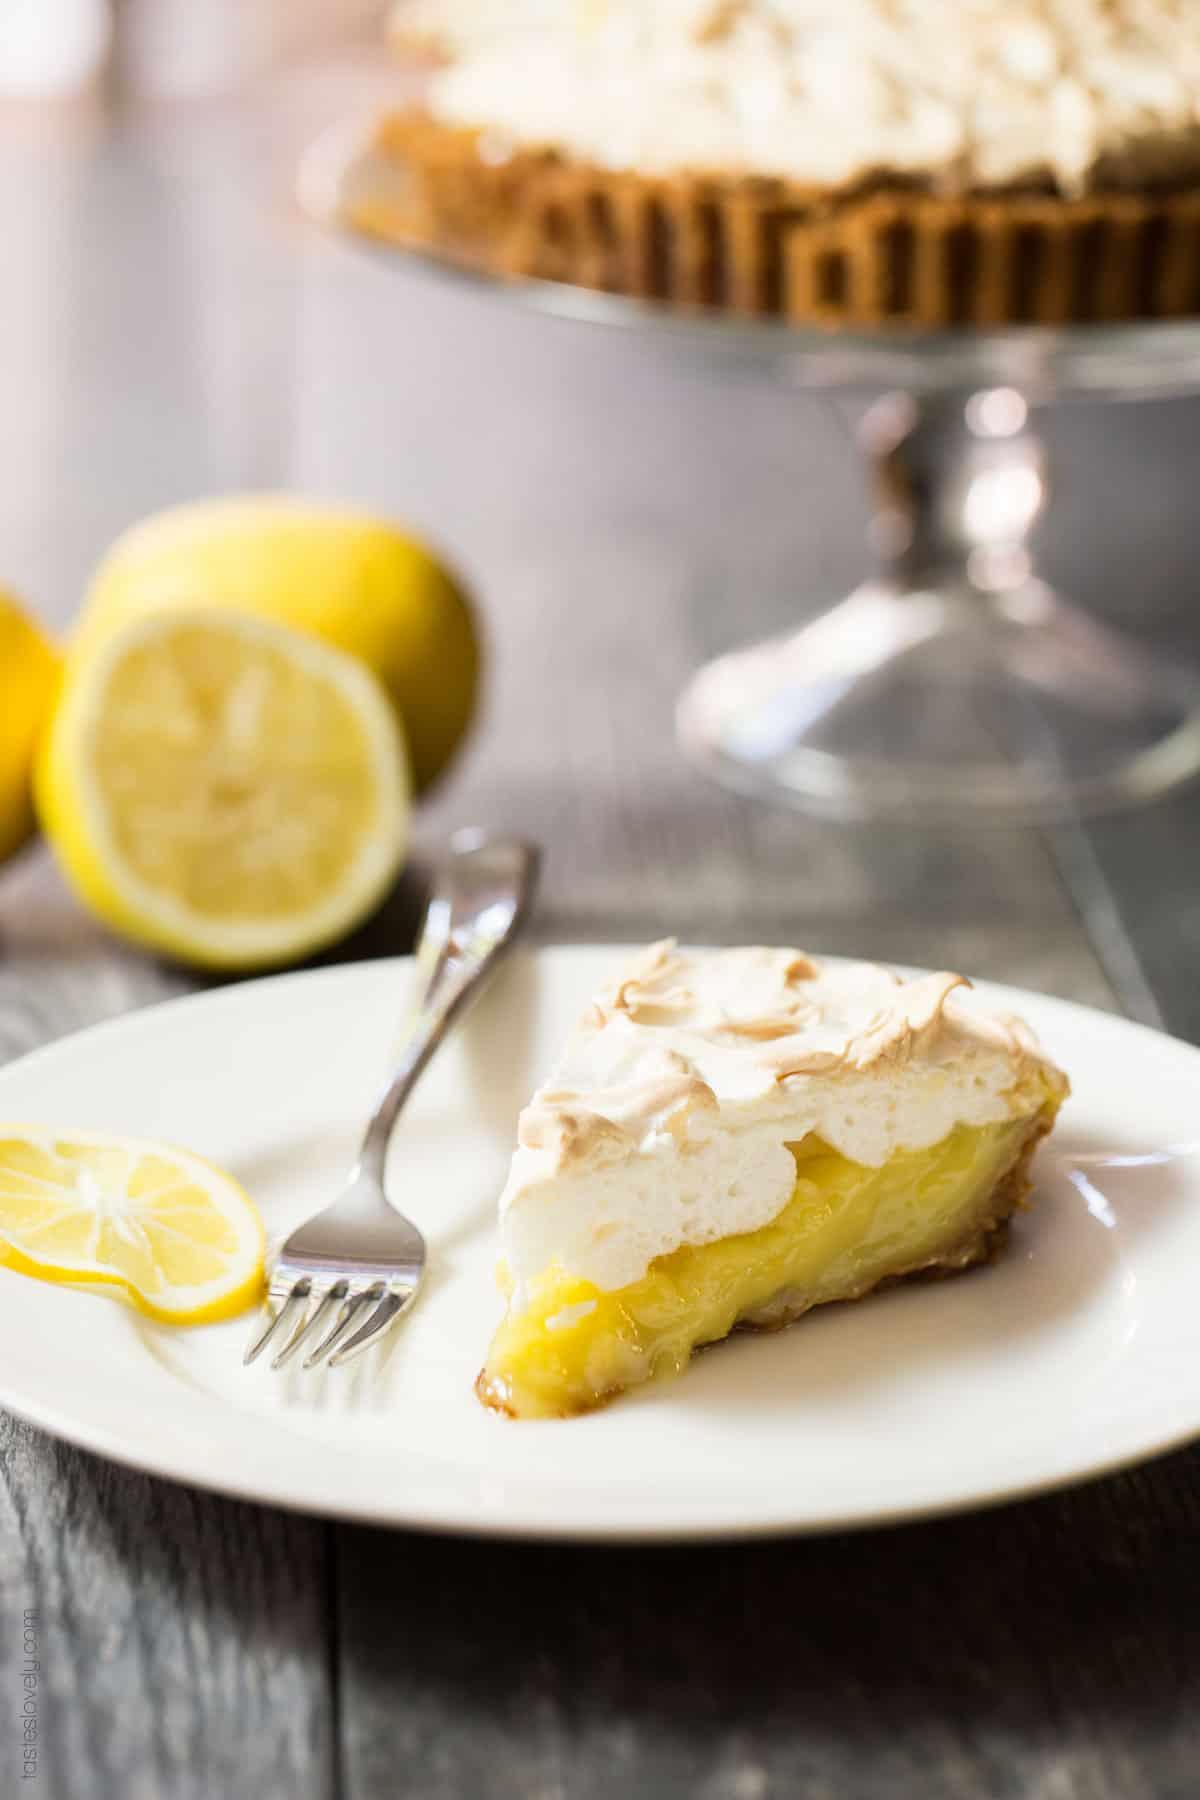 Coconut Oil Lemon Meringue Pie with a graham cracker crust (dairy free)